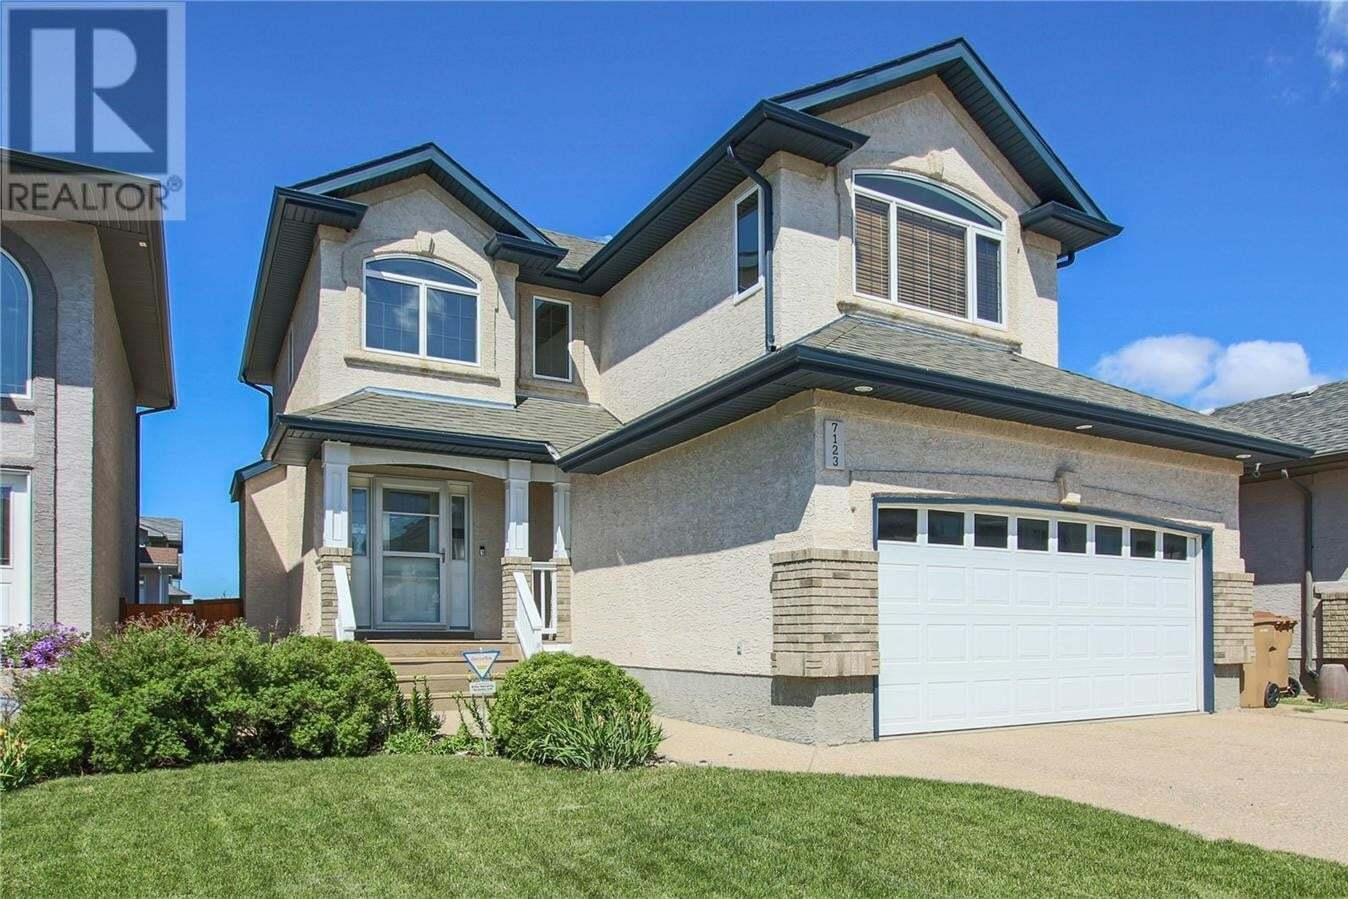 House for sale at 7123 Wascana Cove Dr Regina Saskatchewan - MLS: SK816846